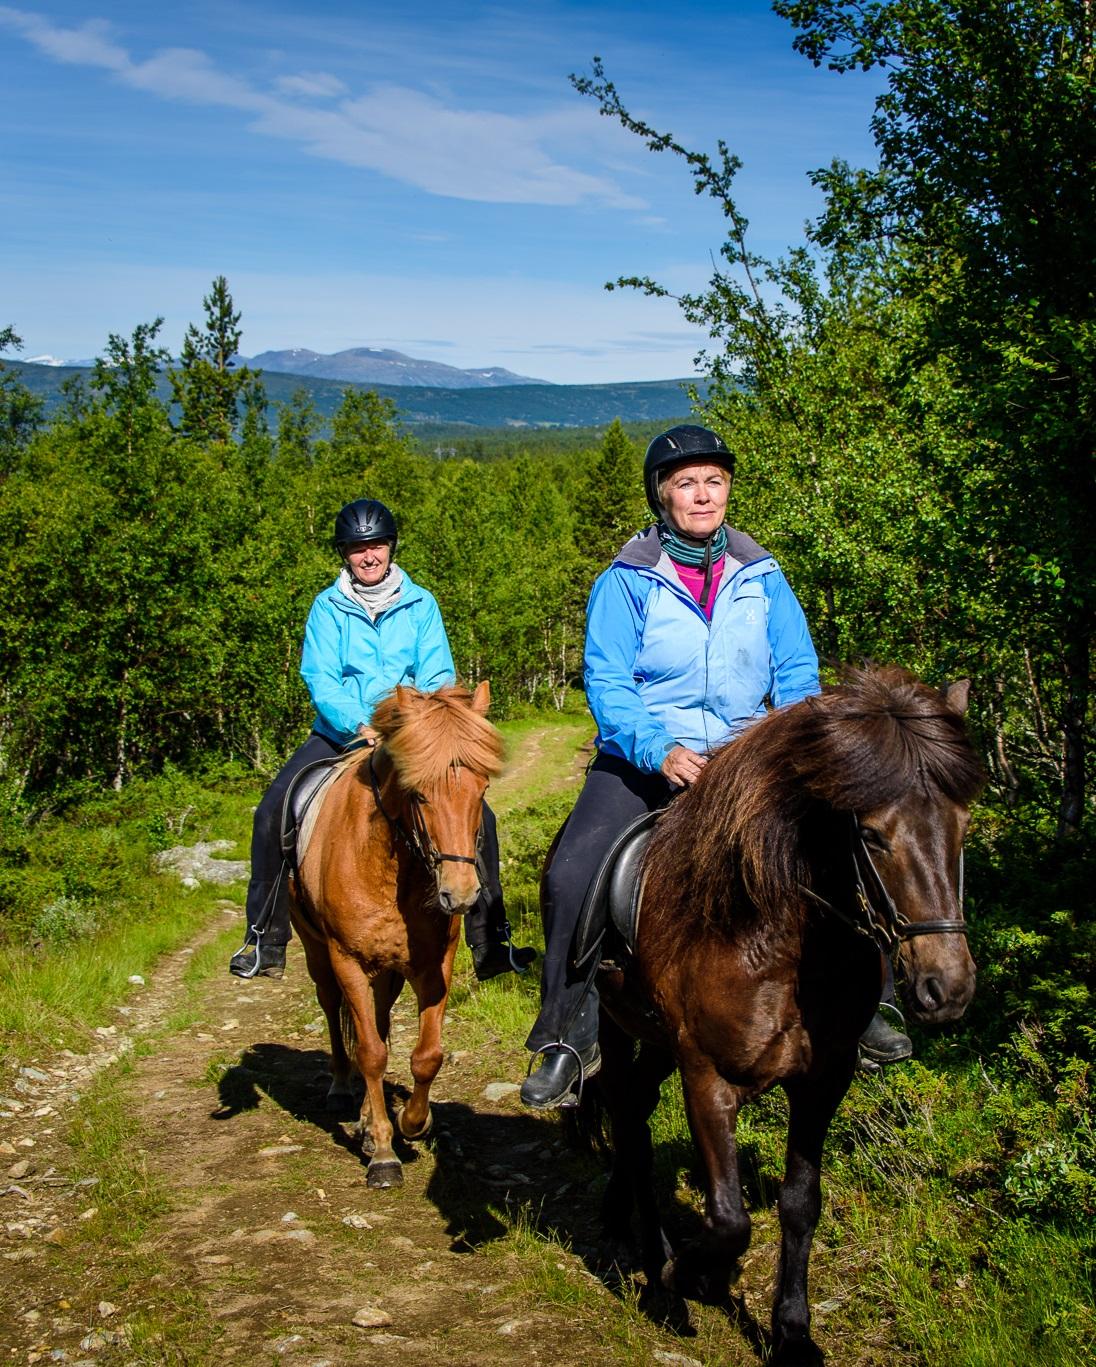 Rideturer i fjellet og rideundervisning på bane